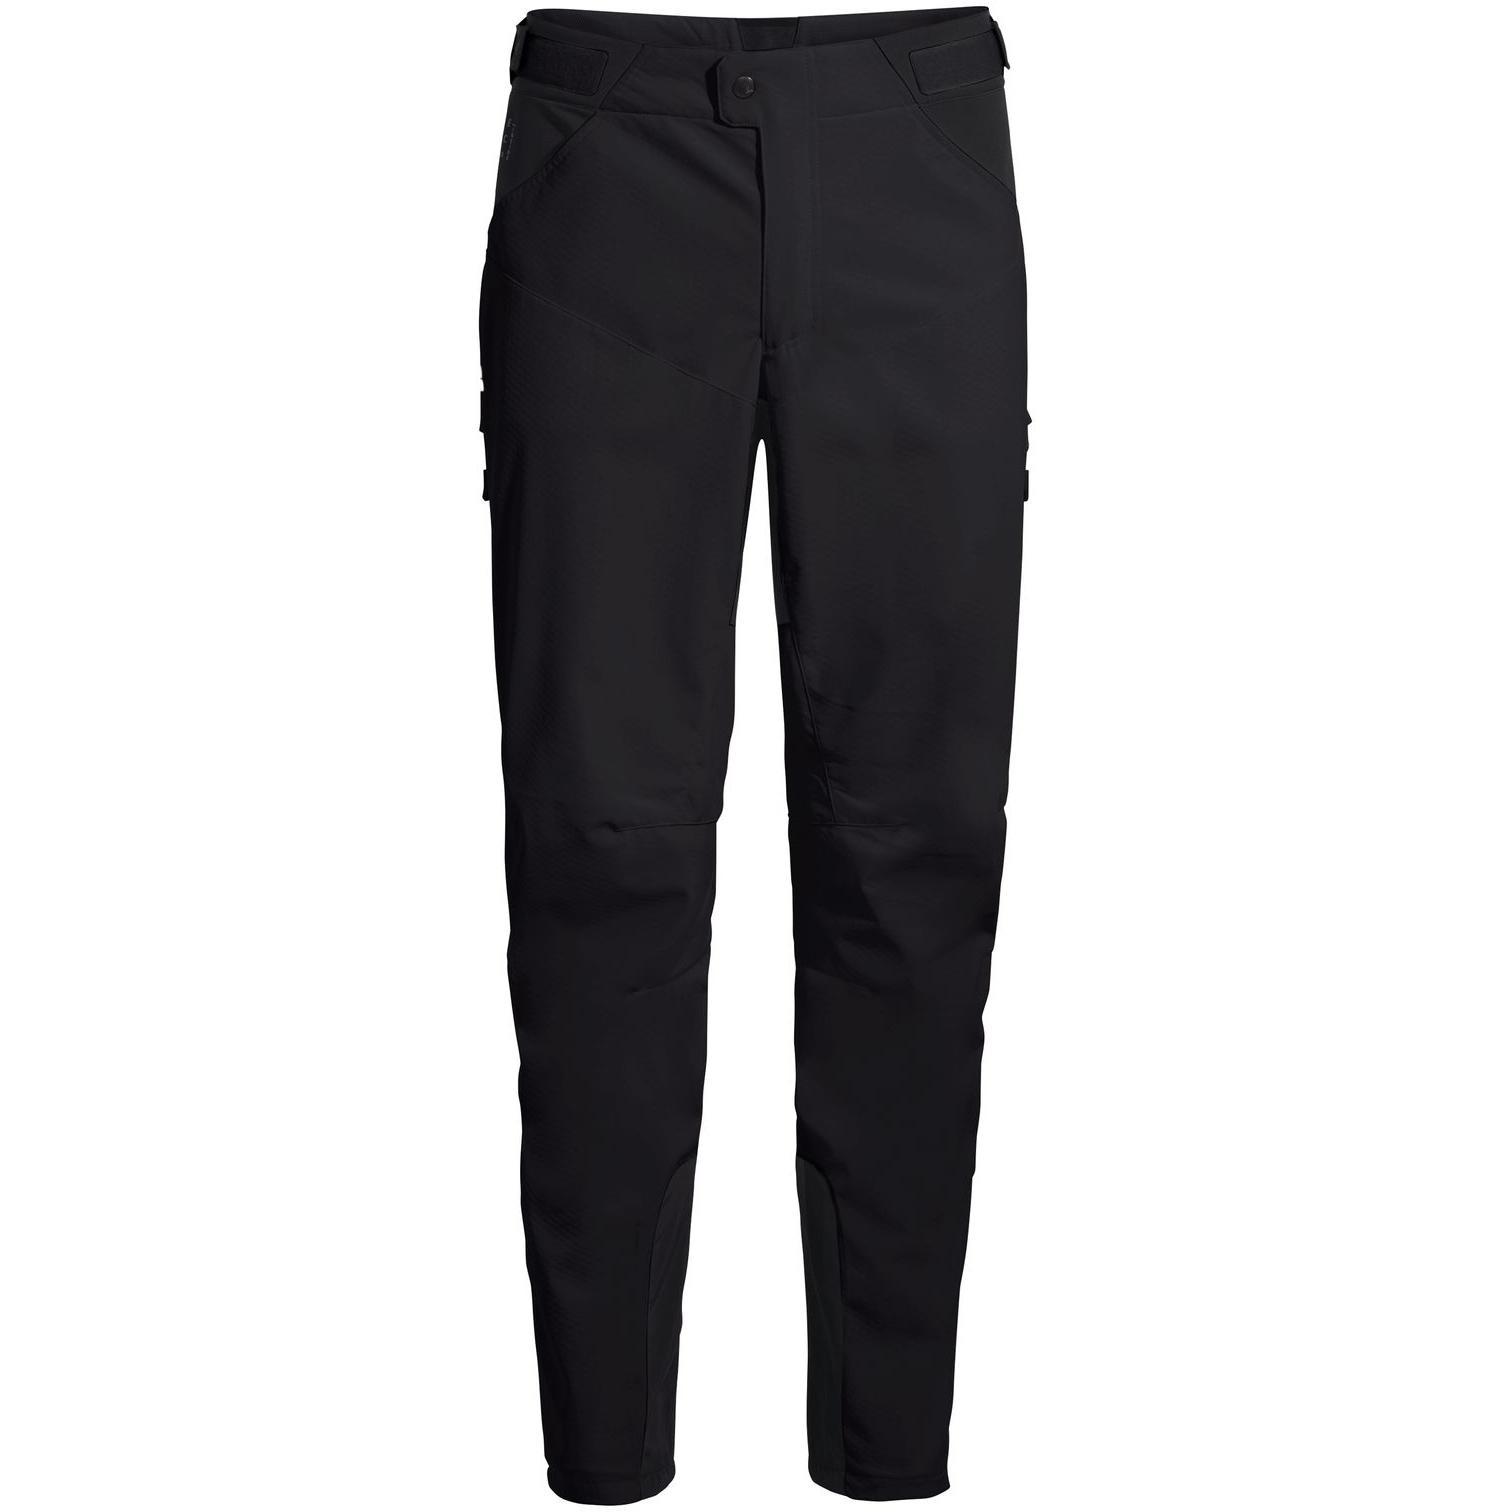 Foto de Vaude Qimsa Softshell Pantalones II - Regular - negro/negro